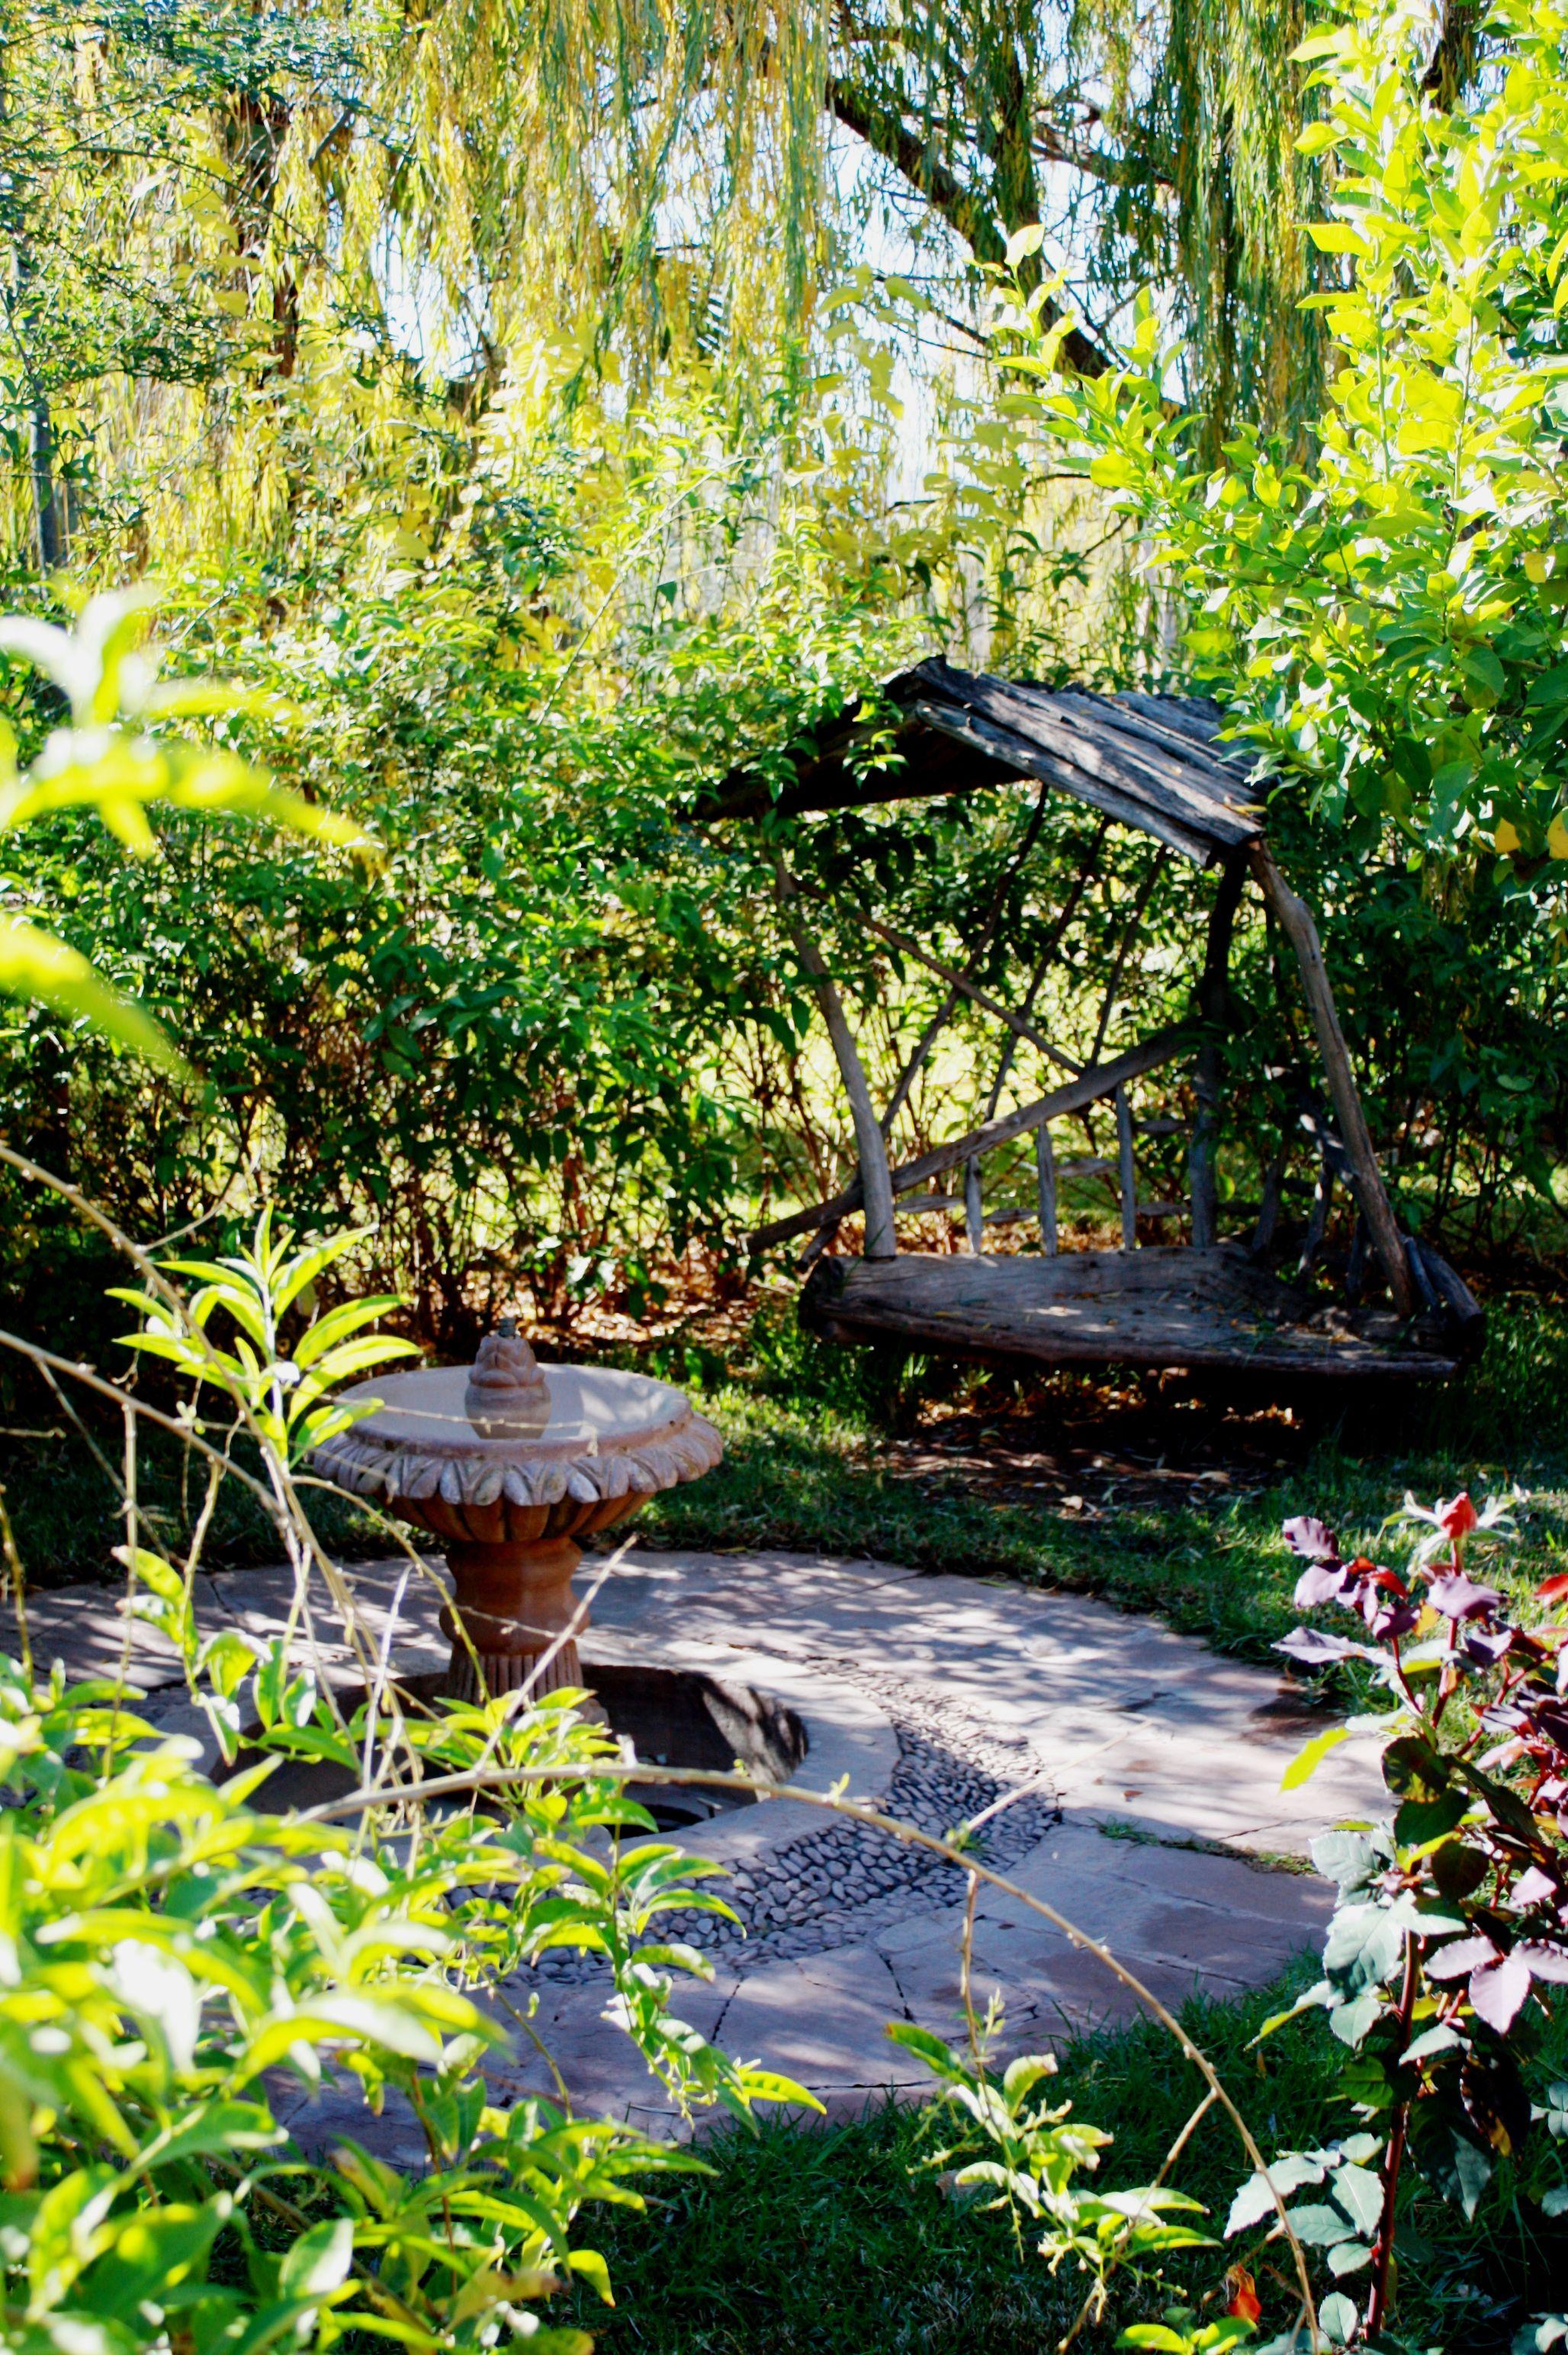 jardin bio aromatique dourika - Jardin Bio